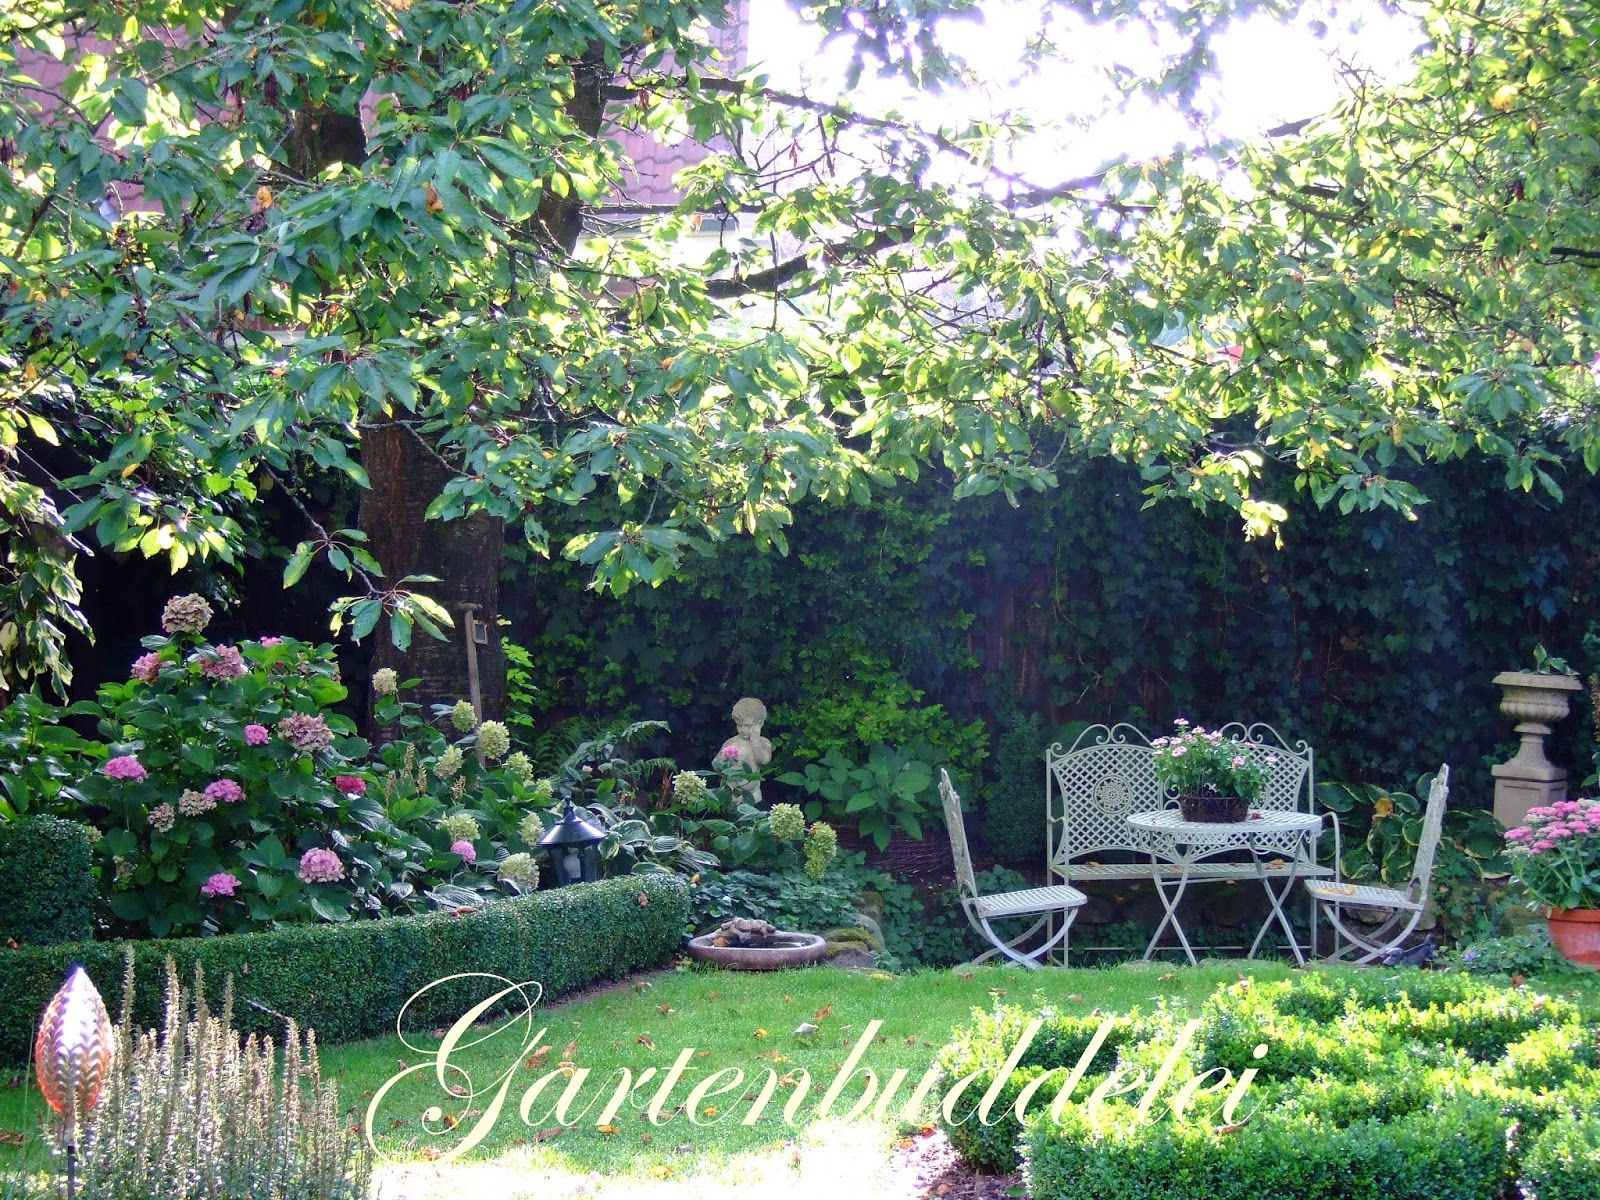 Gartenbuddelei Garden Inspiration Pinterest Garten